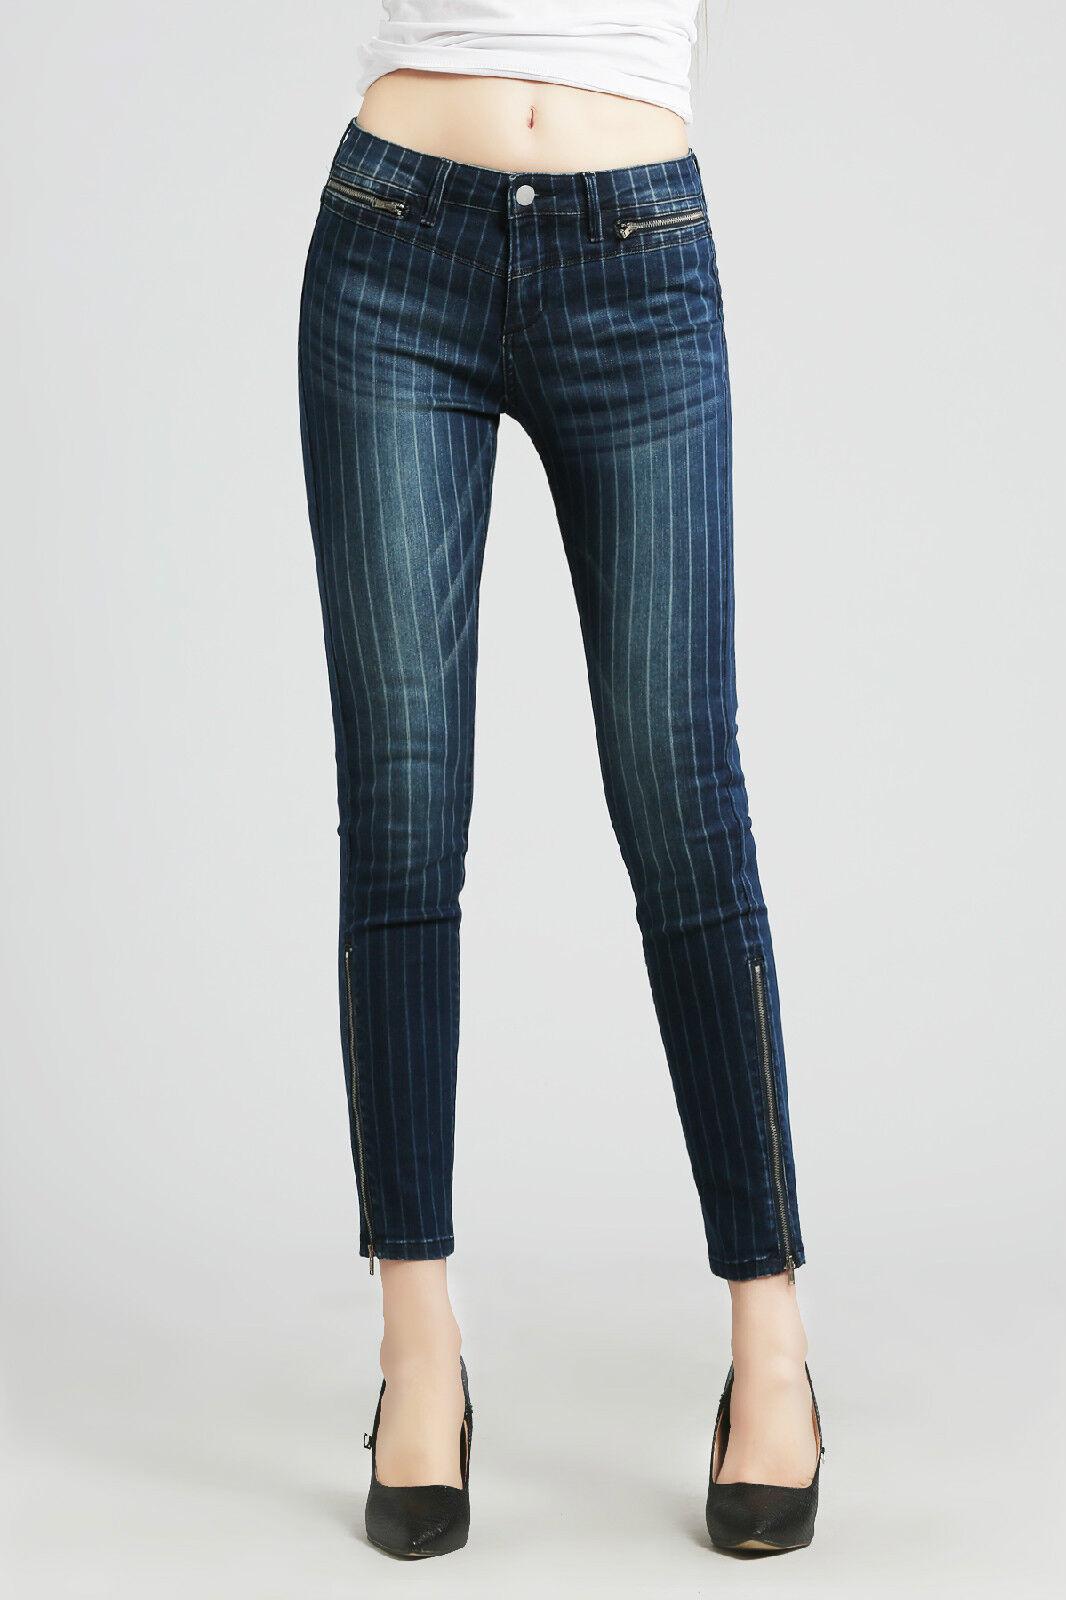 Women Denim Laser Printed Zip Skinny Jeans Stretch Pants Low Rise Slim Size 30